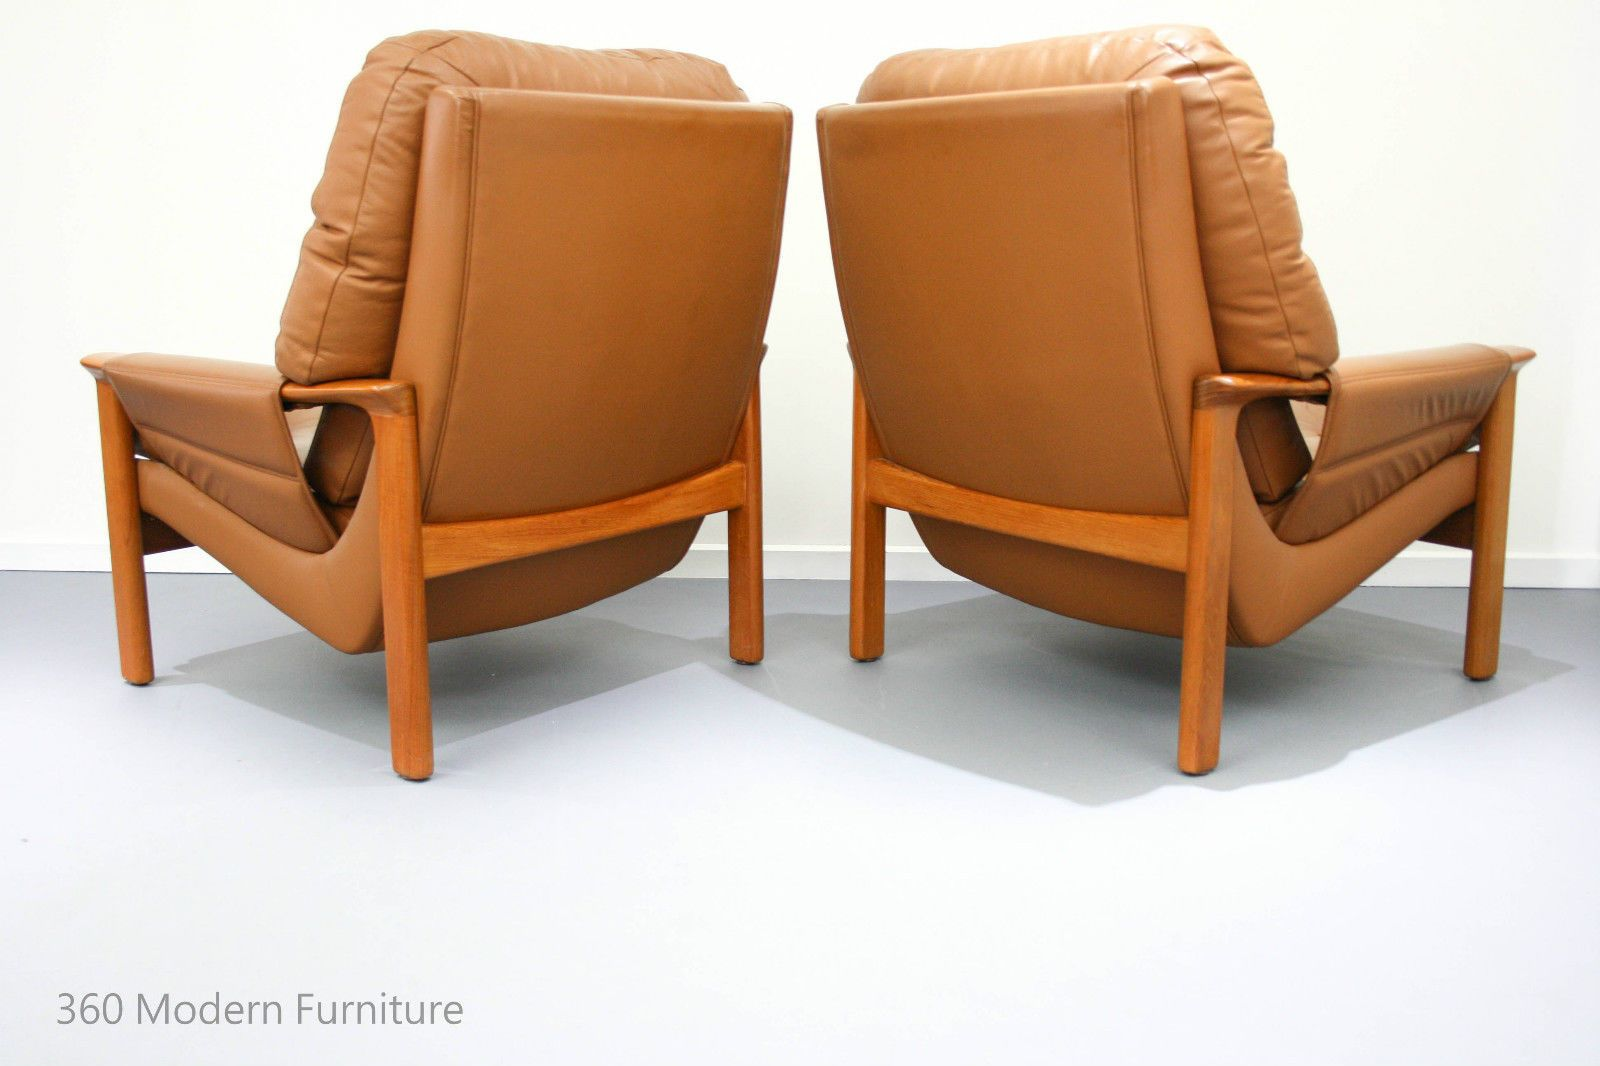 Tessa Leather 3 seater 2 Armchairs Retro Vintage Lounge Suite Sofa